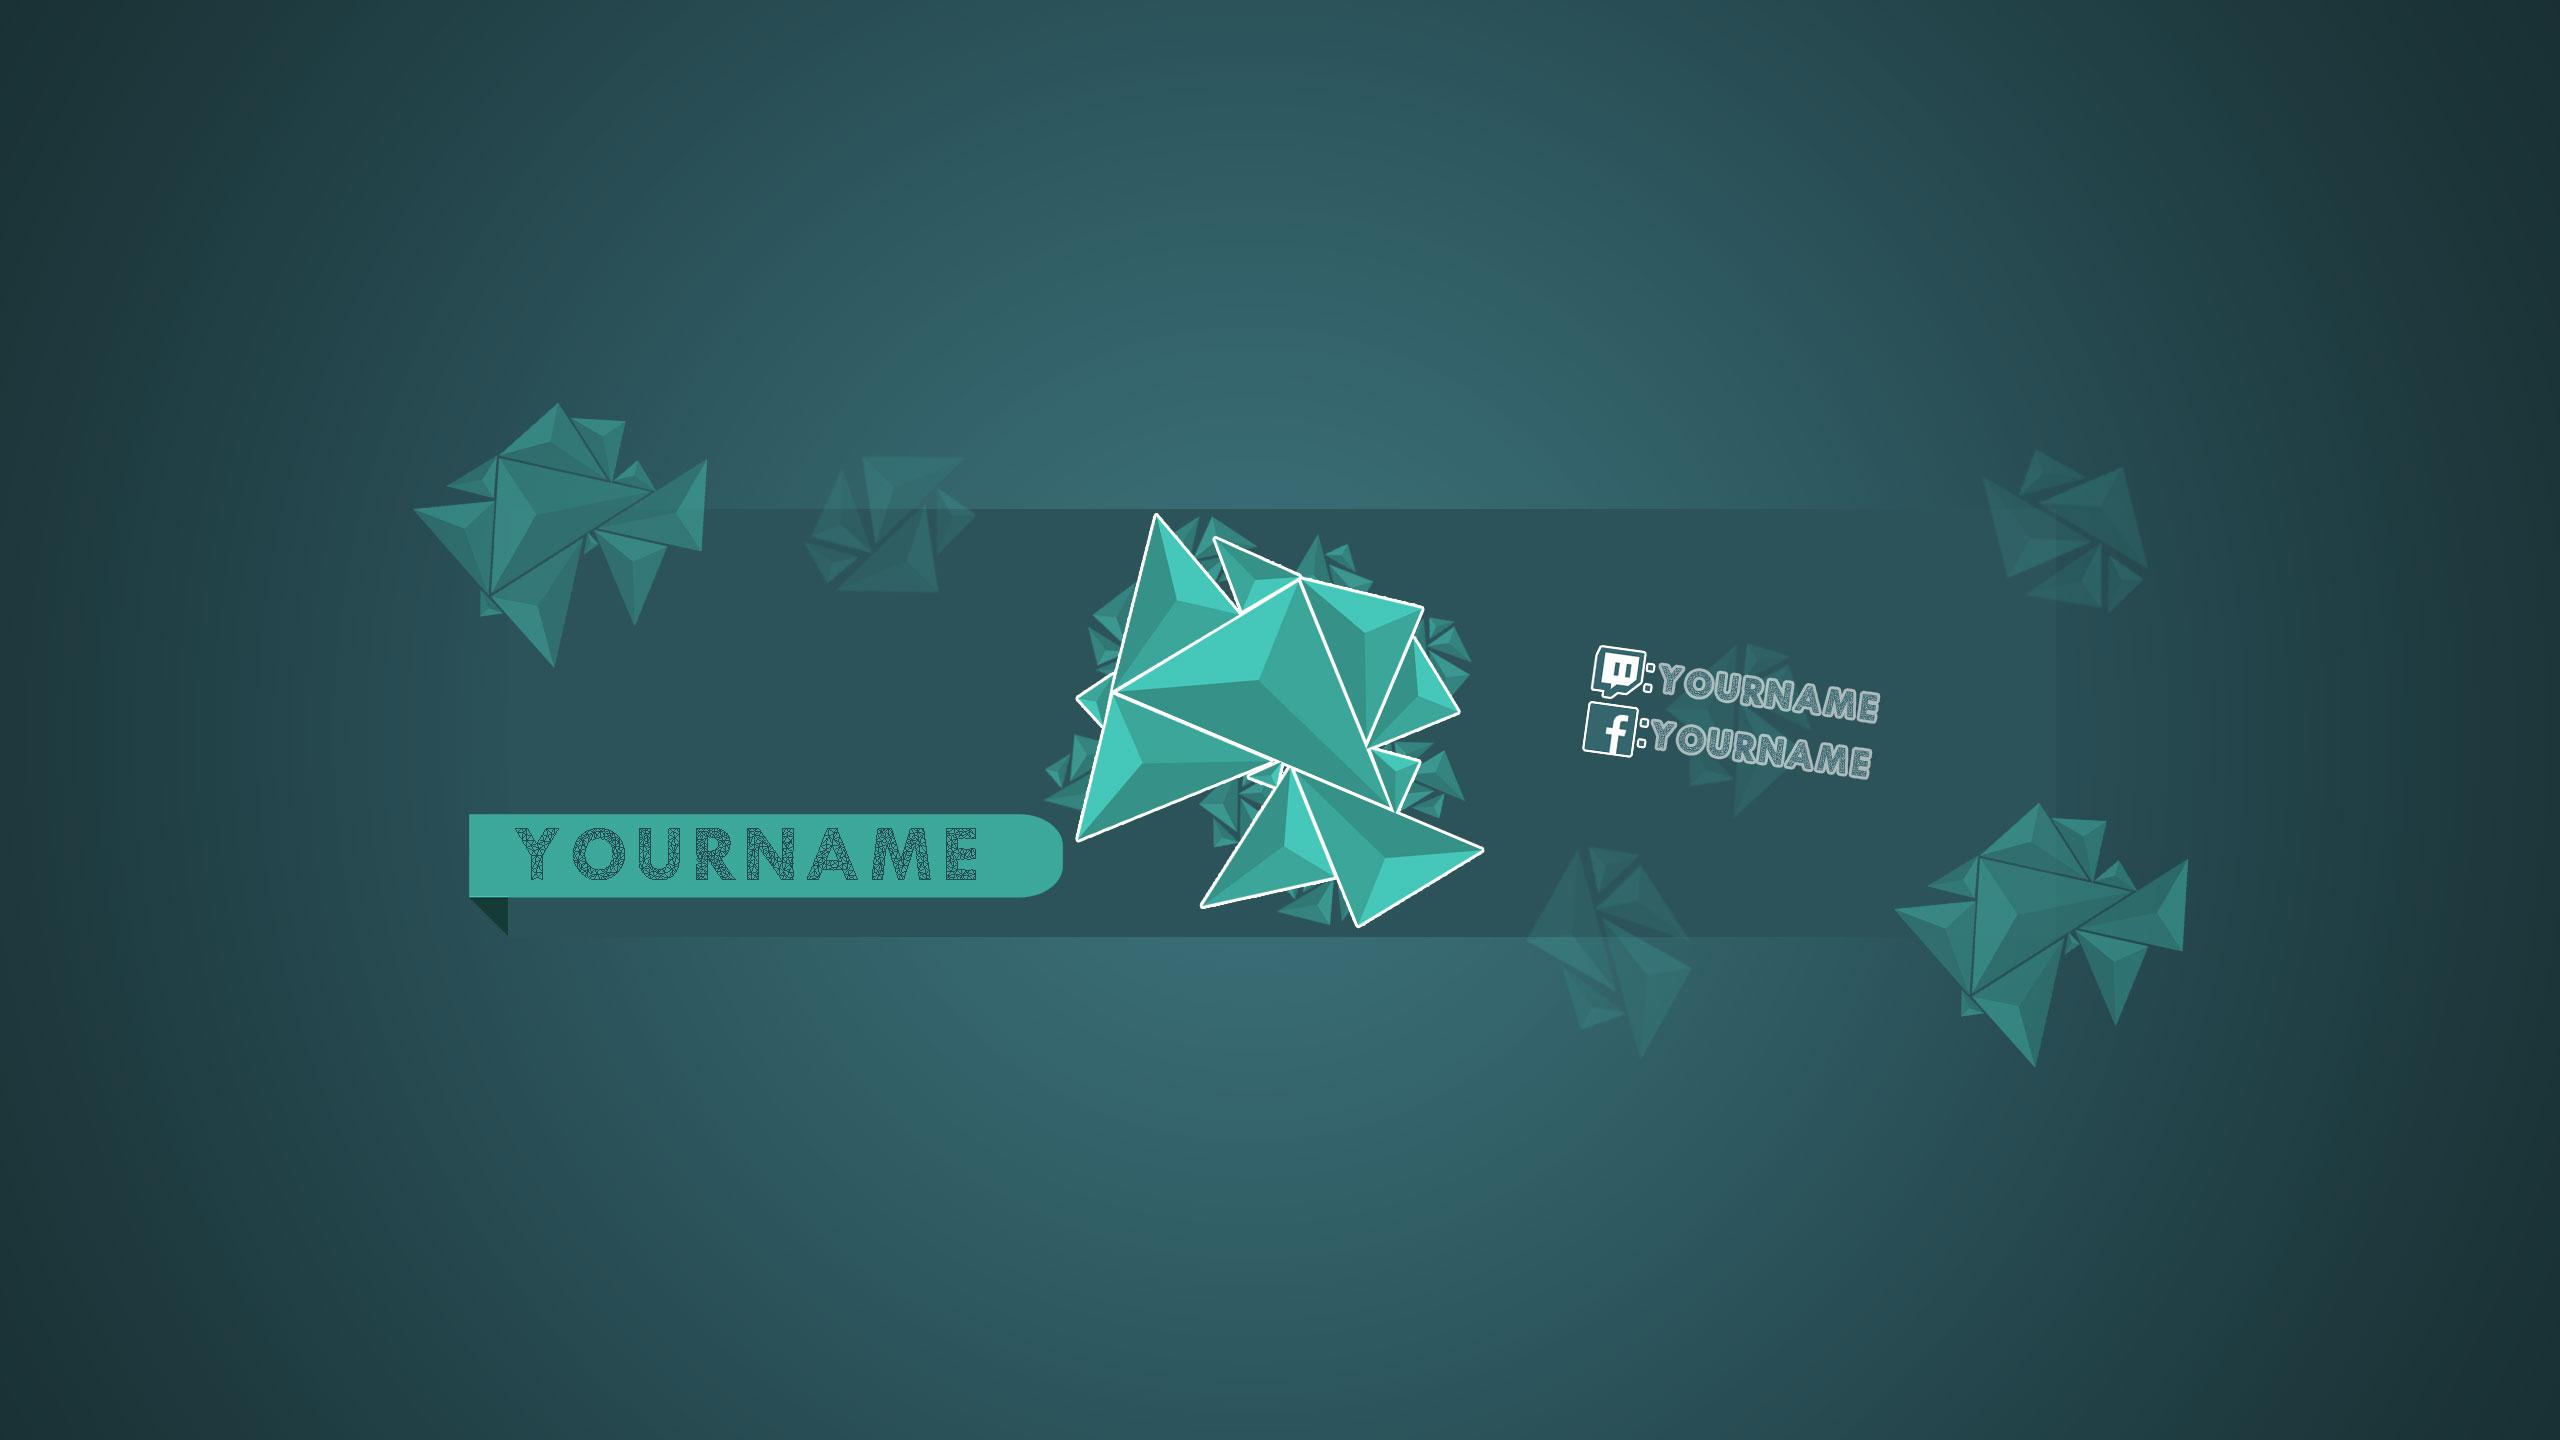 YouTube Polygon Banner by Bulbasuer on DeviantArt